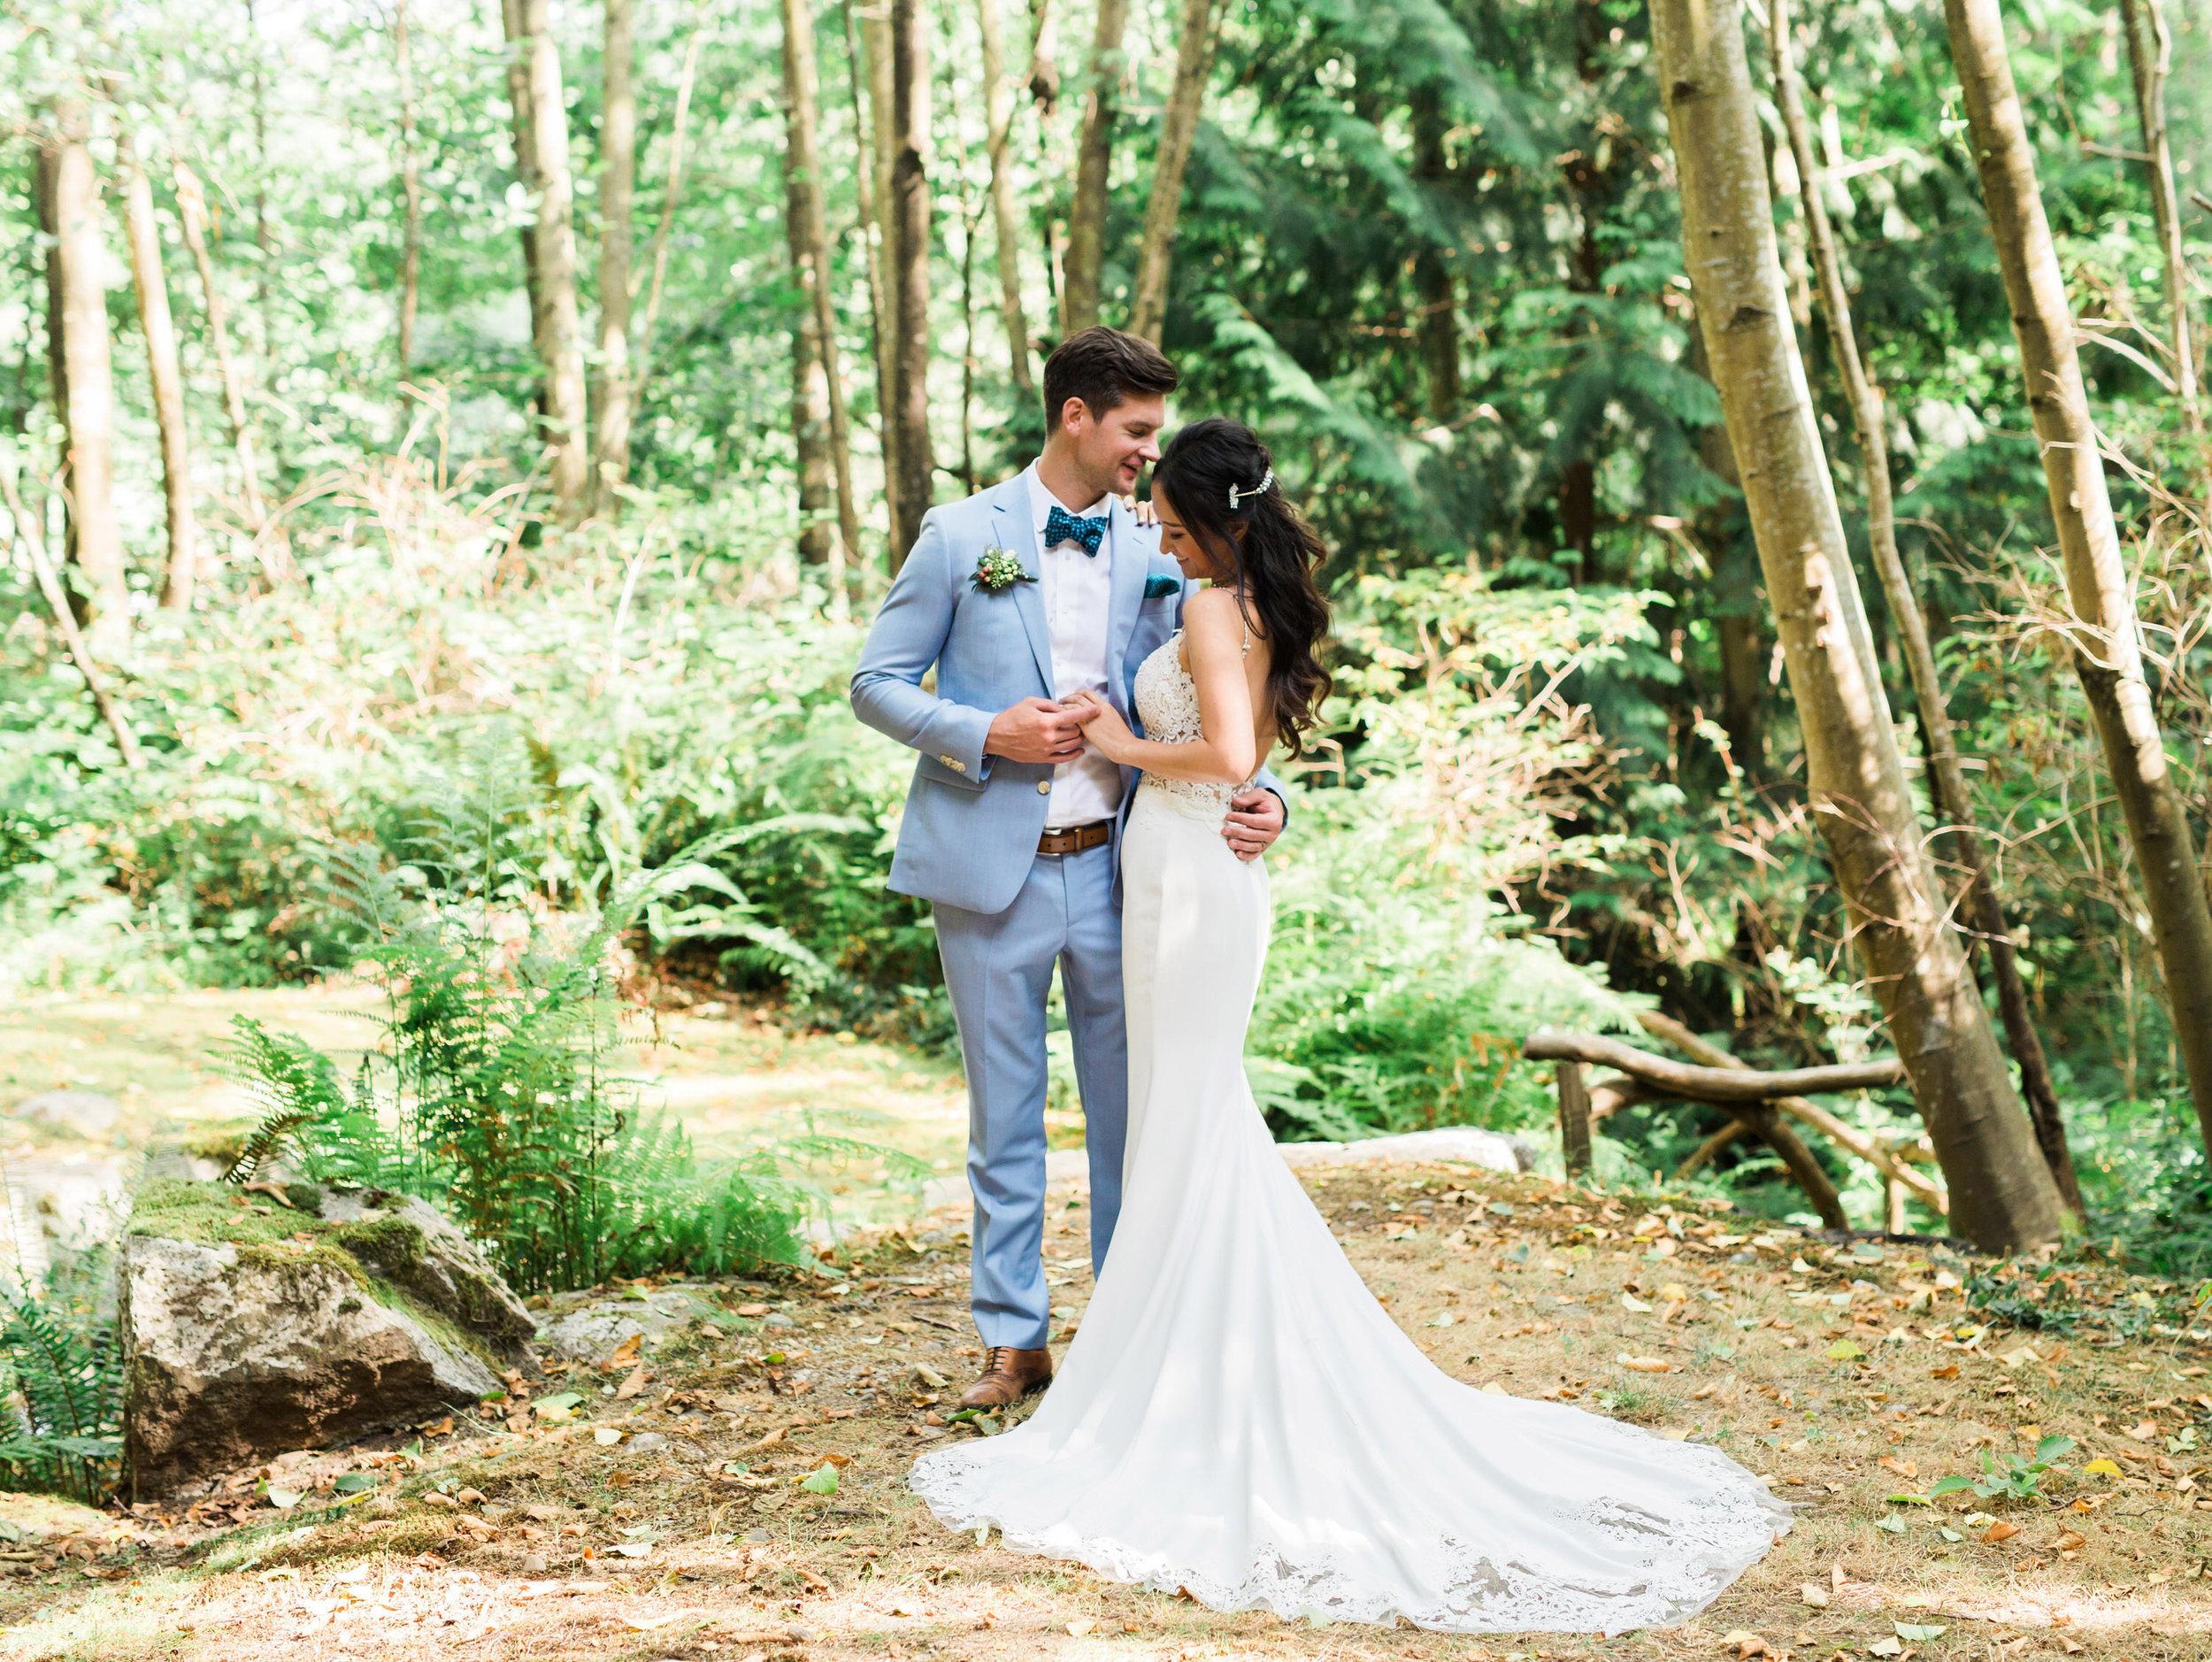 Linwood House Wedding Photos - Roberts Creek Wedding Photos - Vancouver Wedding Photographer & Videographer - Sunshine Coast Wedding Photos - Sunshine Coast Wedding Photographer - Jennifer Picard Photography - IMG_8122.jpg